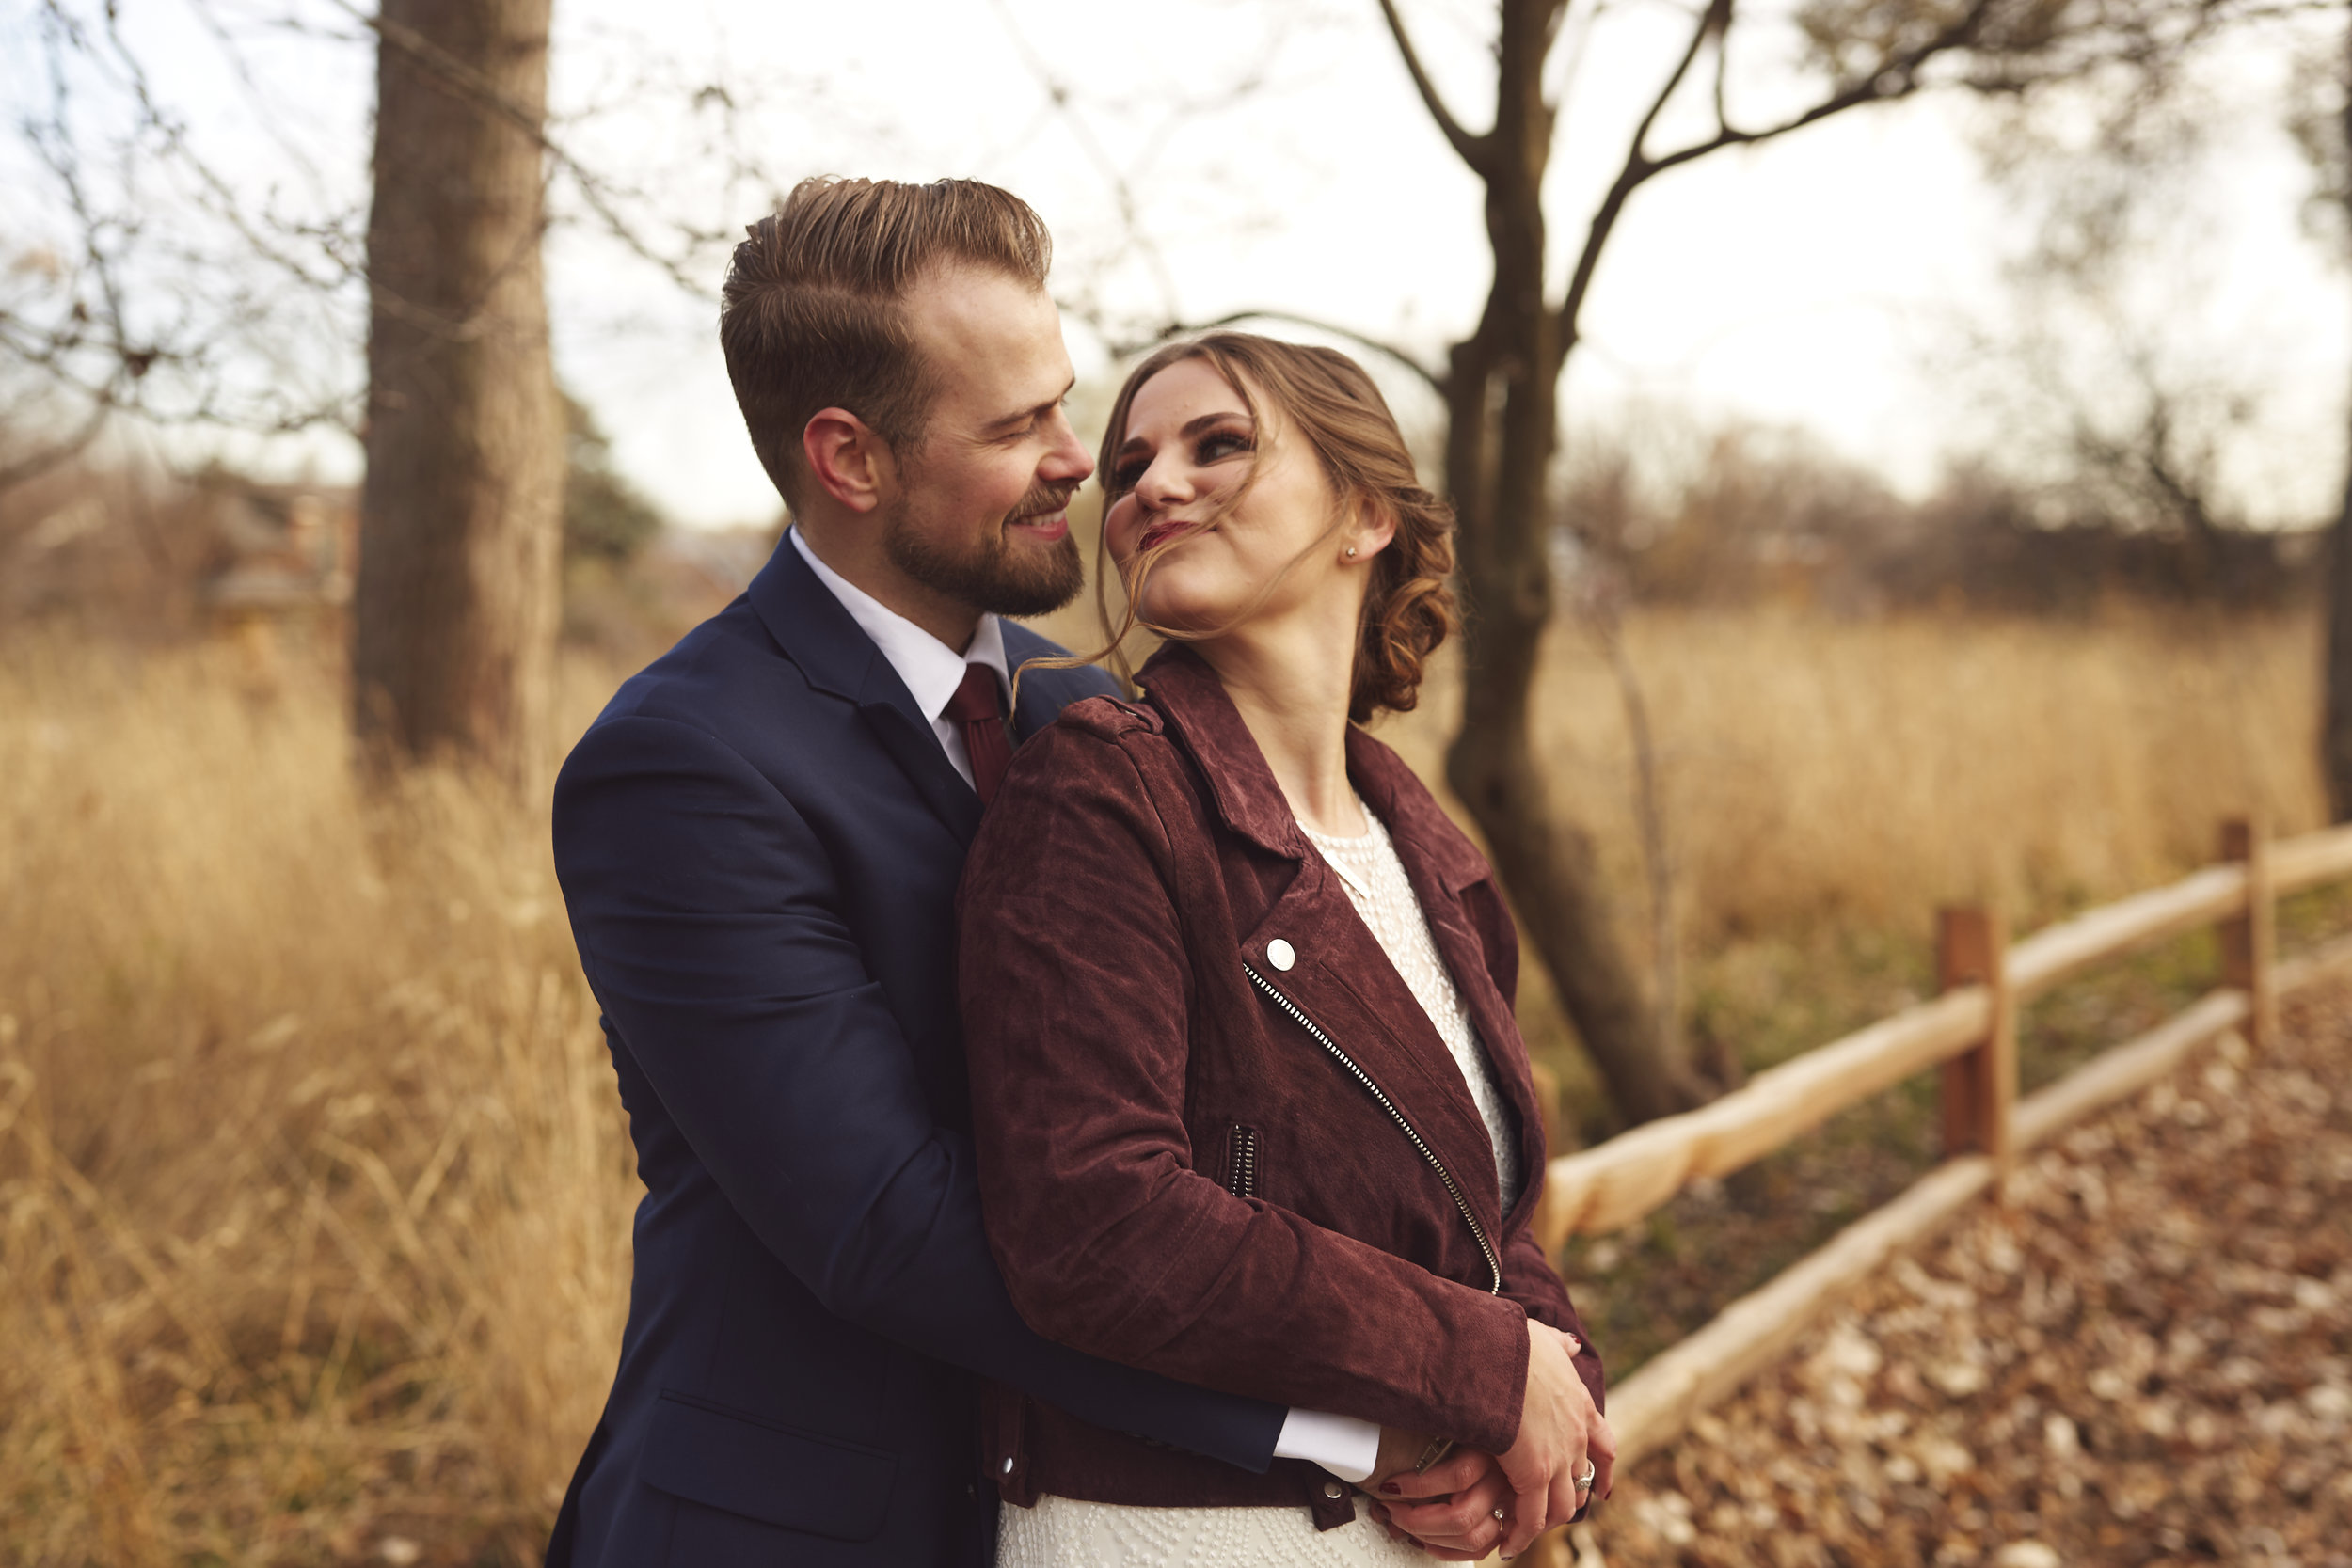 Jen & Ben Wedding - benromangphoto - 6I5A9982.jpg